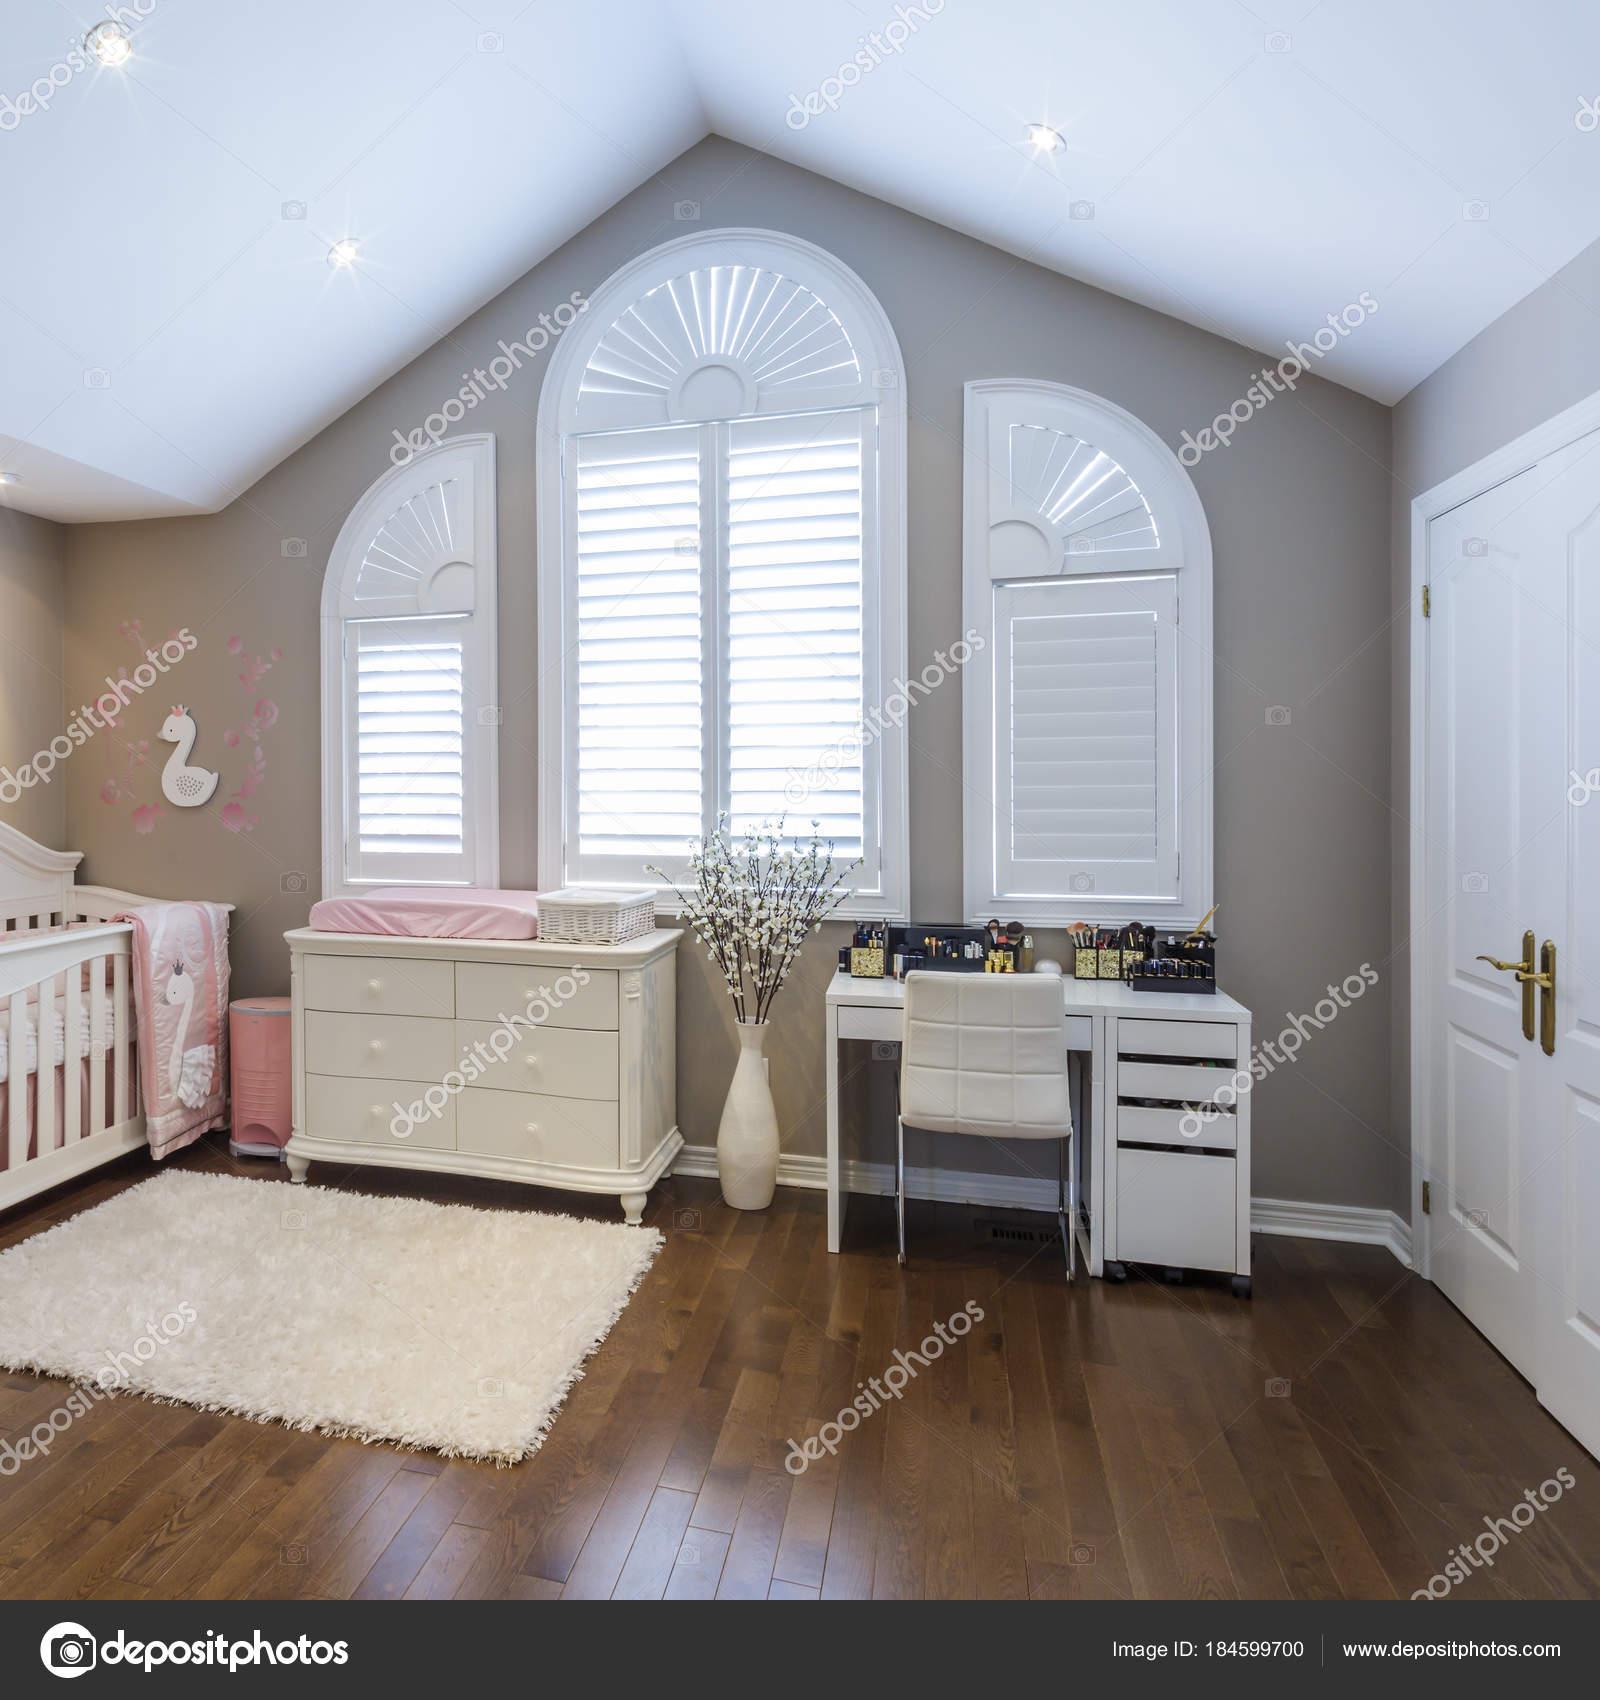 kinderkamer interieur stockfoto